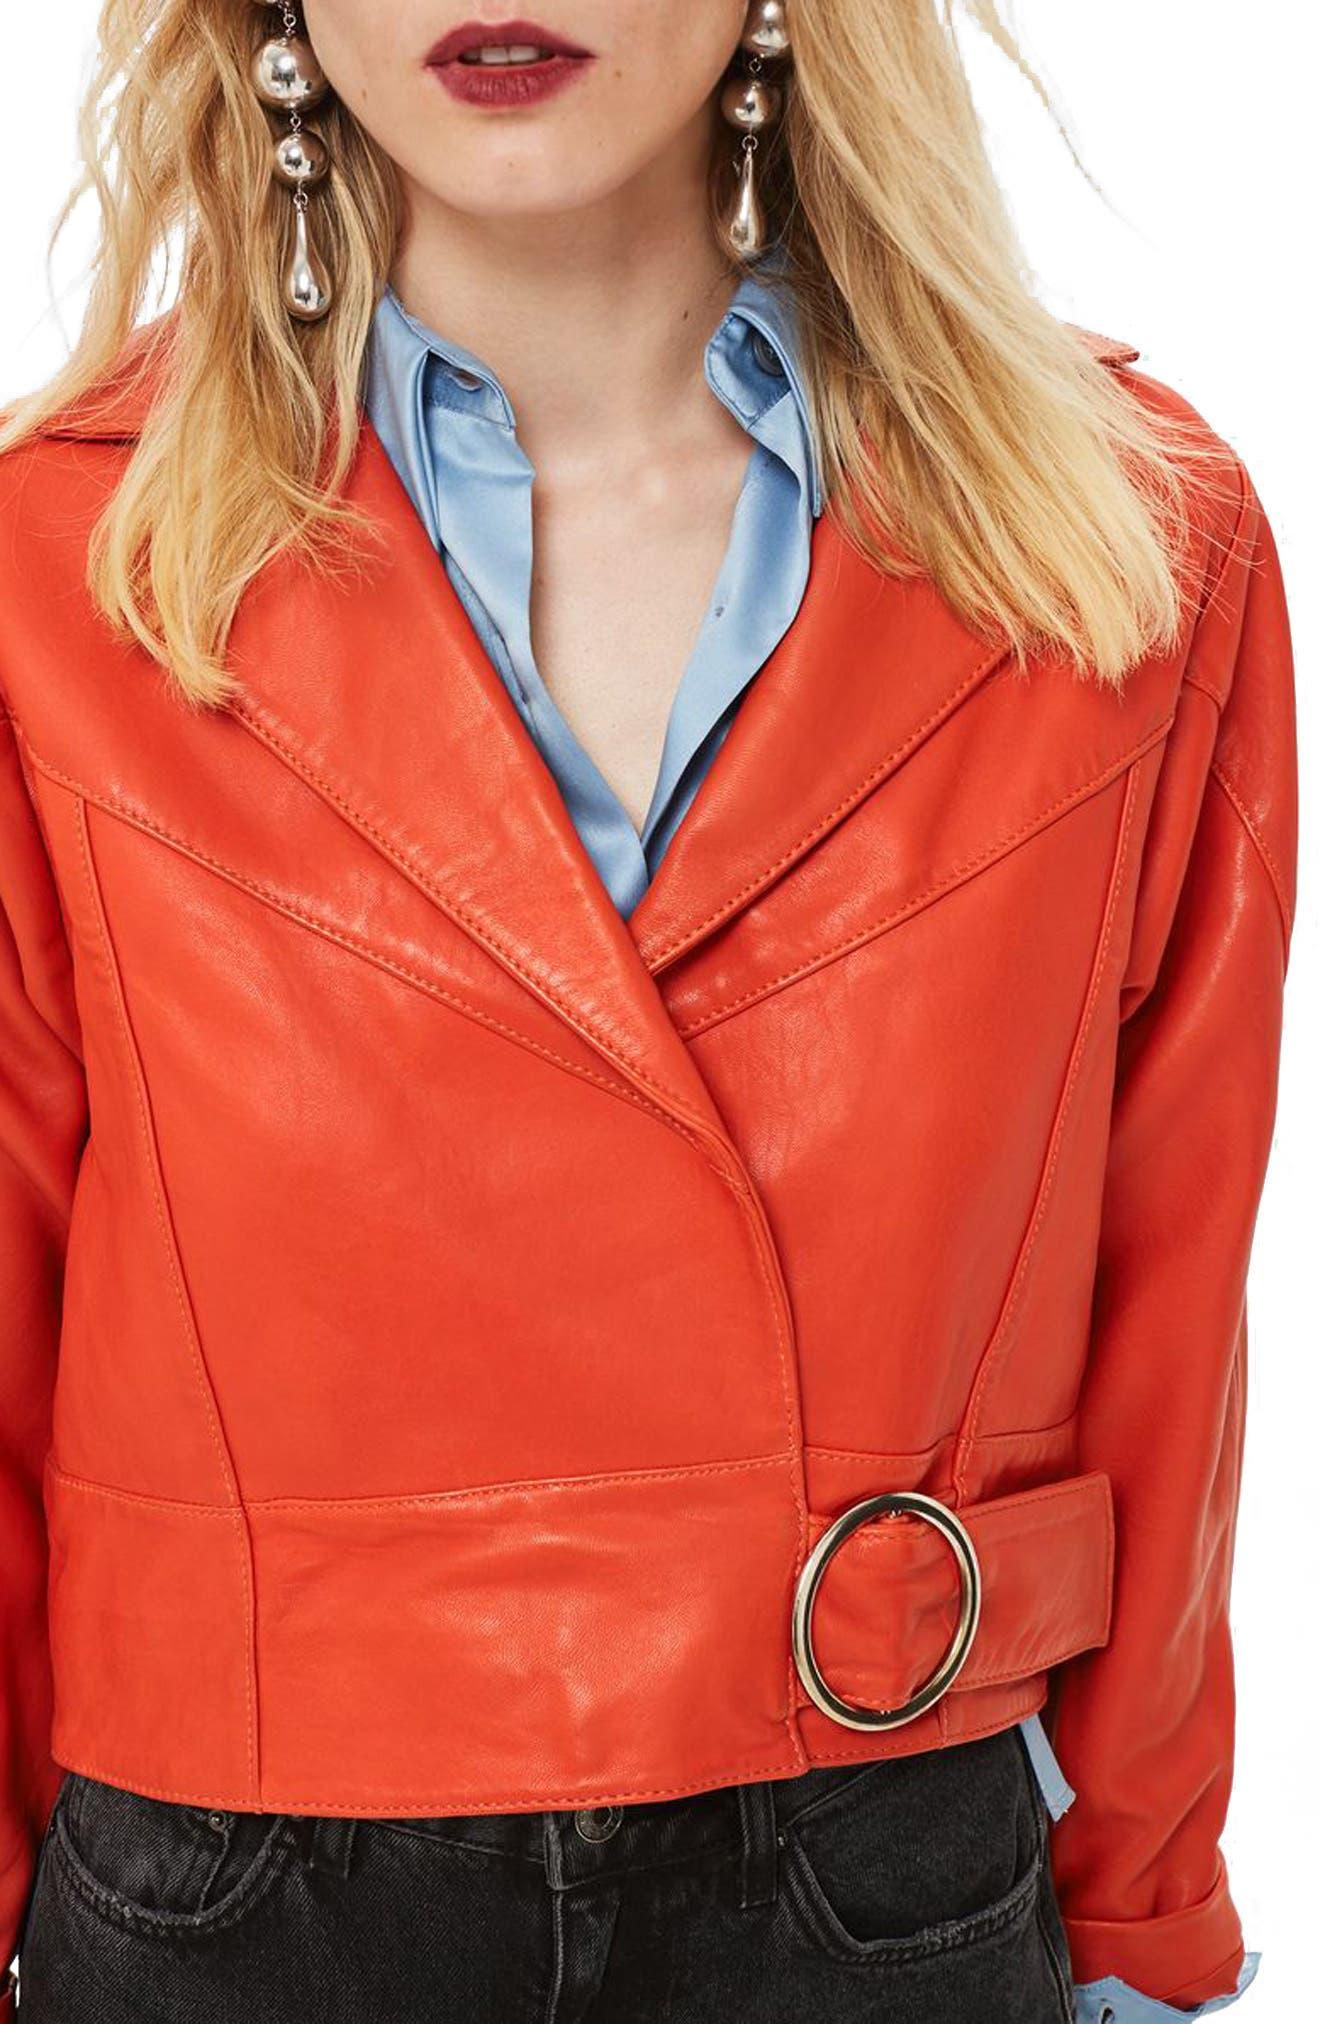 Vintage Coats & Jackets | Retro Coats and Jackets Womens Topshop Crop Leather Moto Jacket $215.97 AT vintagedancer.com